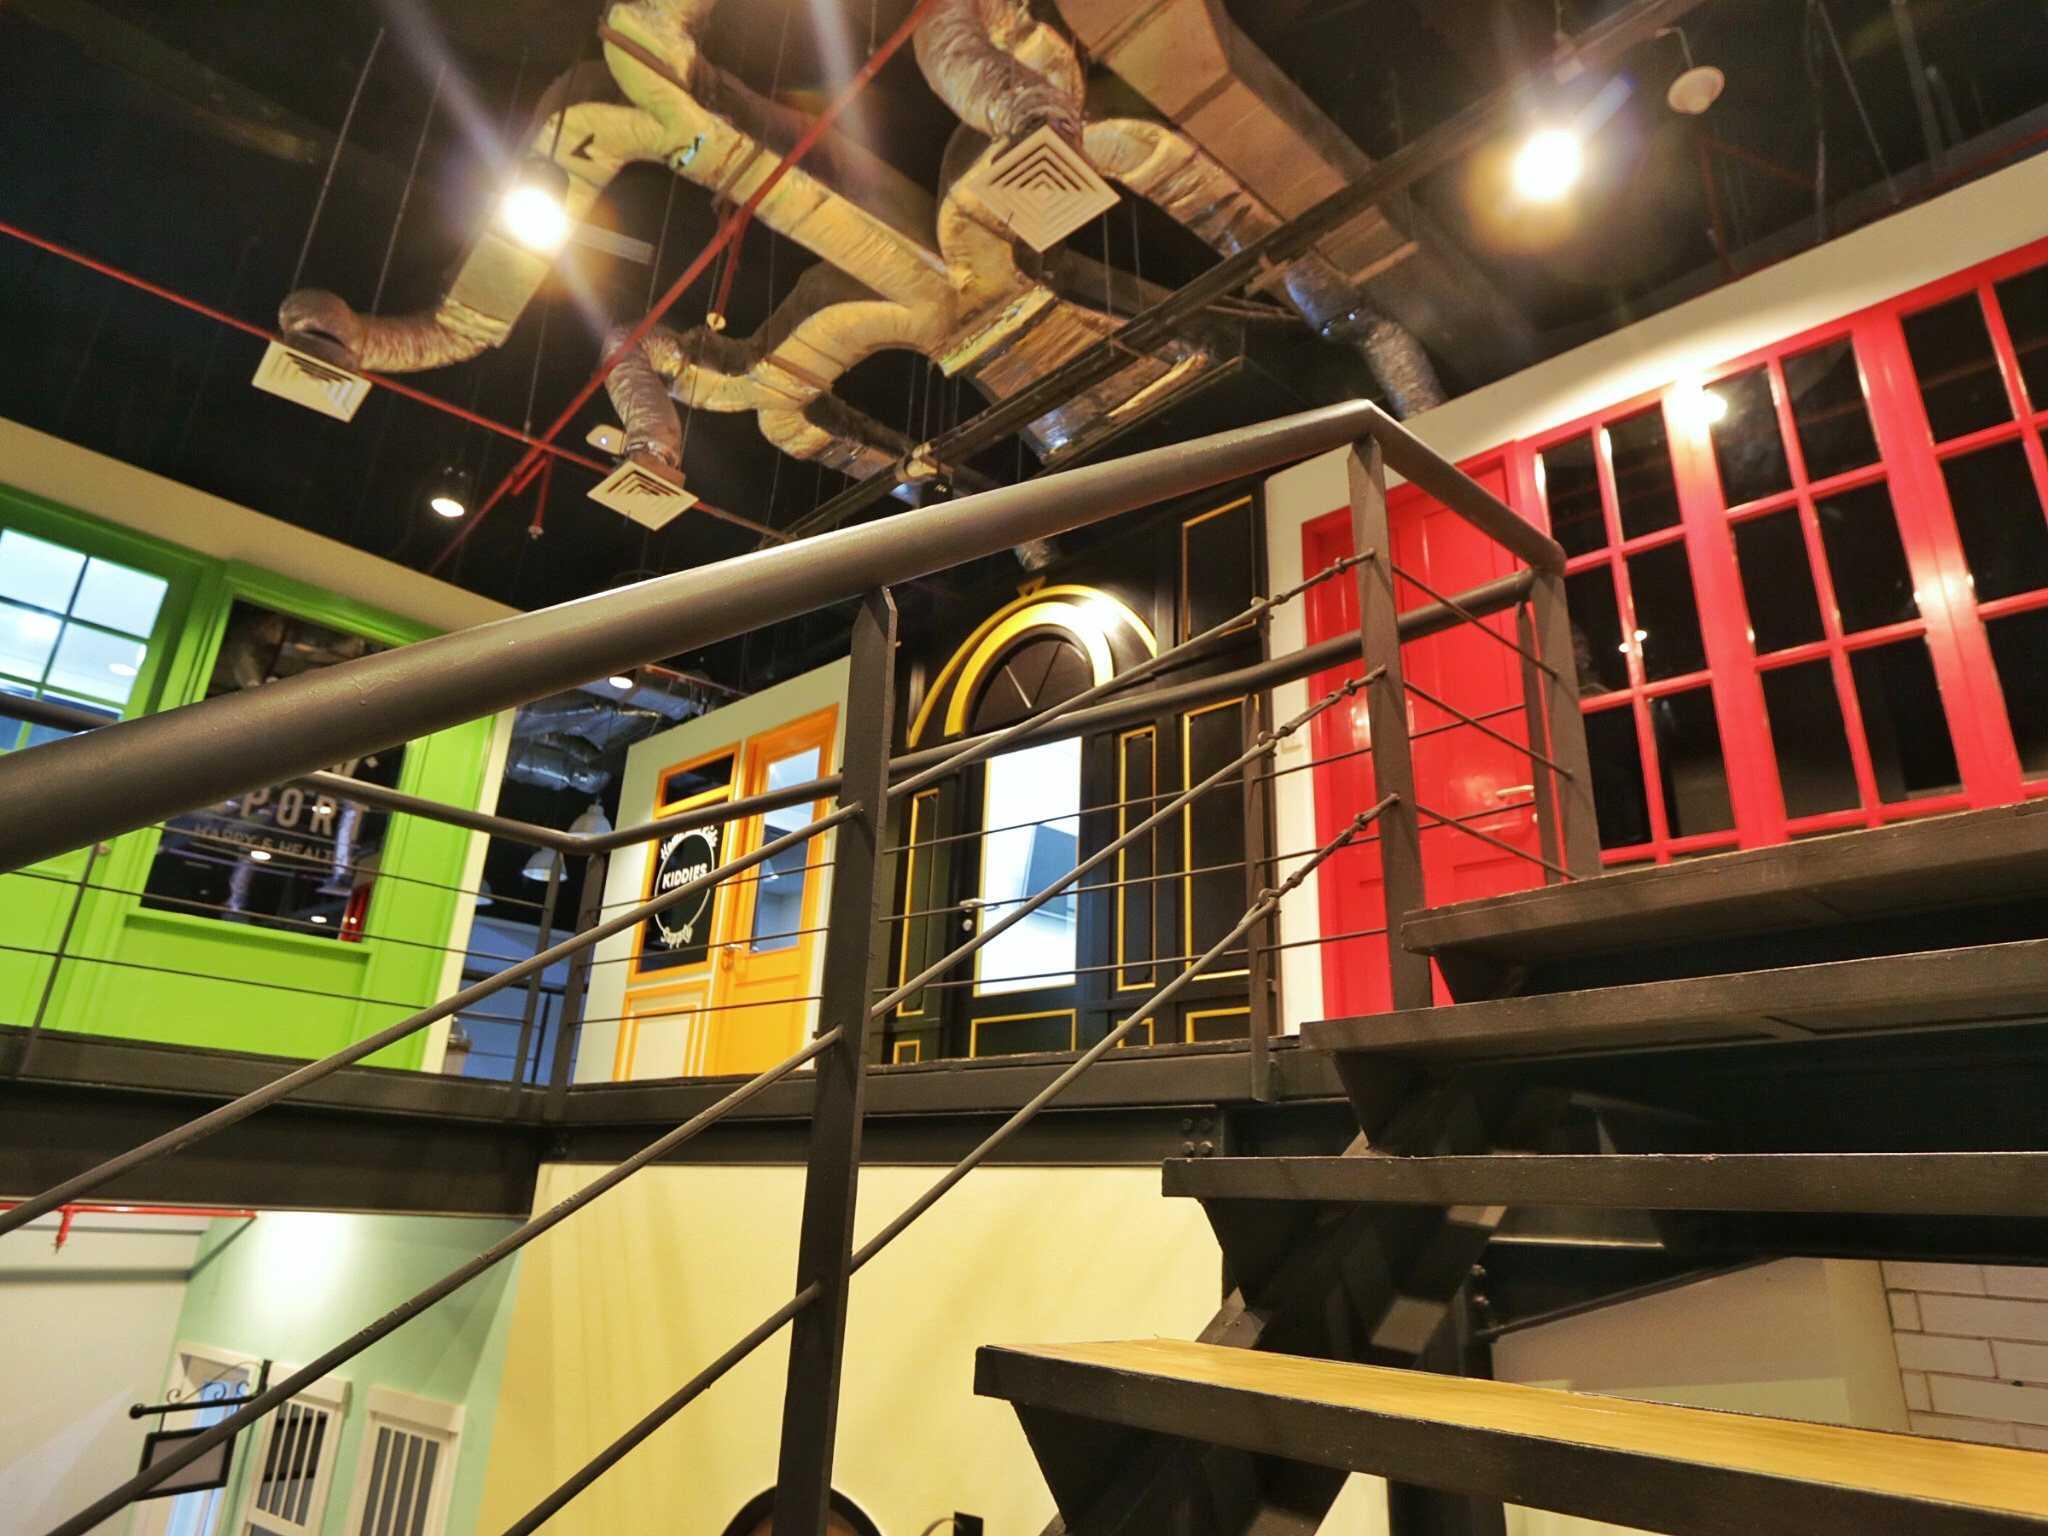 Kotak Design Elevenia Office Daerah Khusus Ibukota Jakarta, Indonesia Daerah Khusus Ibukota Jakarta, Indonesia Kotak-Design-Elevenia-Office  56778